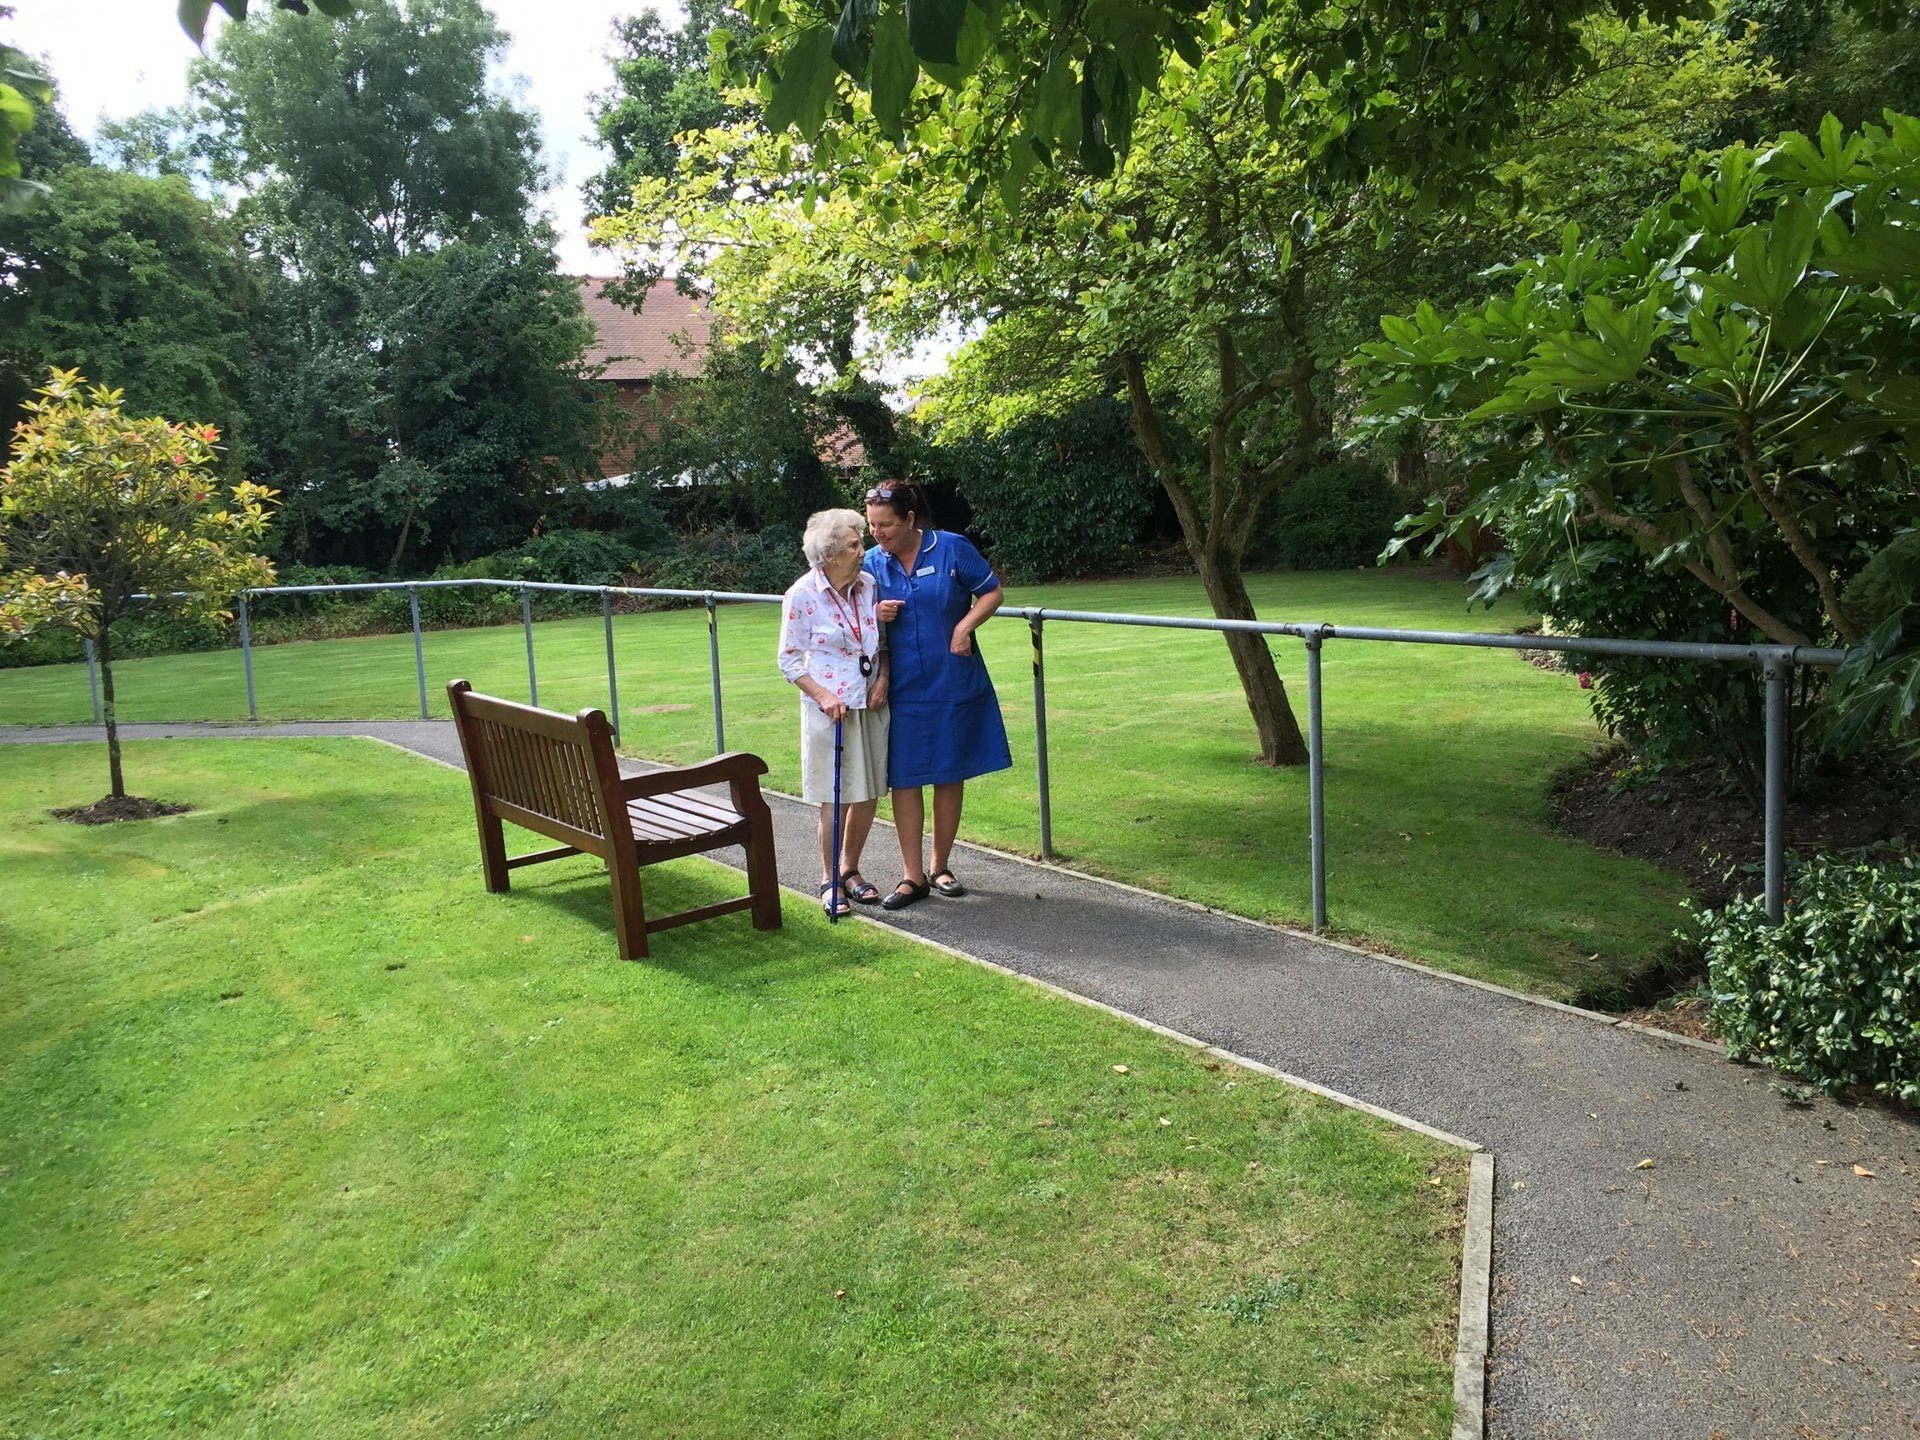 Avon Park Care Home - resident and nurse on a walk